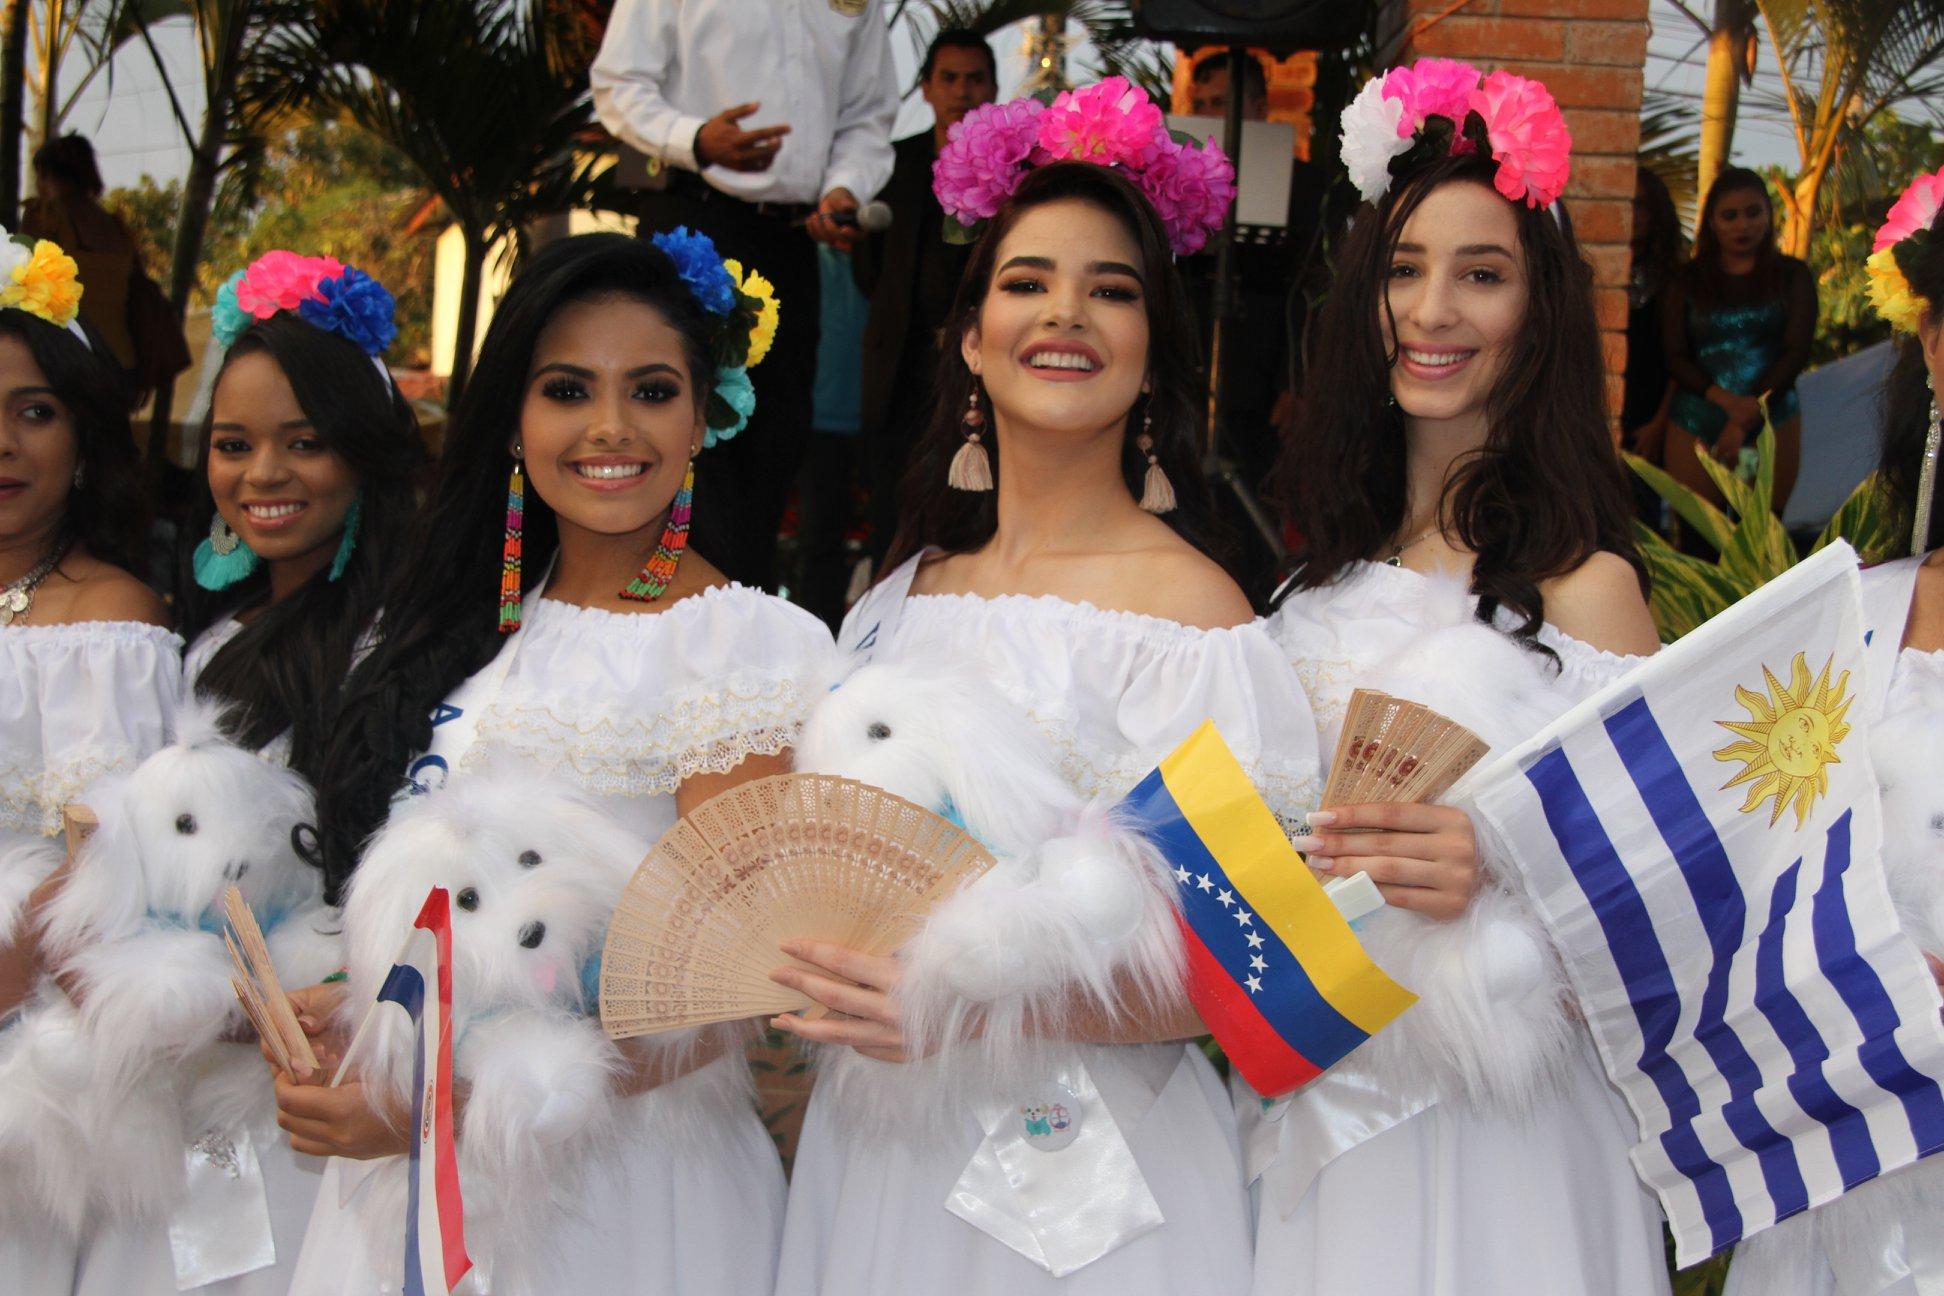 daniela di venere, top 12 de miss teen mundial 2019. - Página 4 60522610